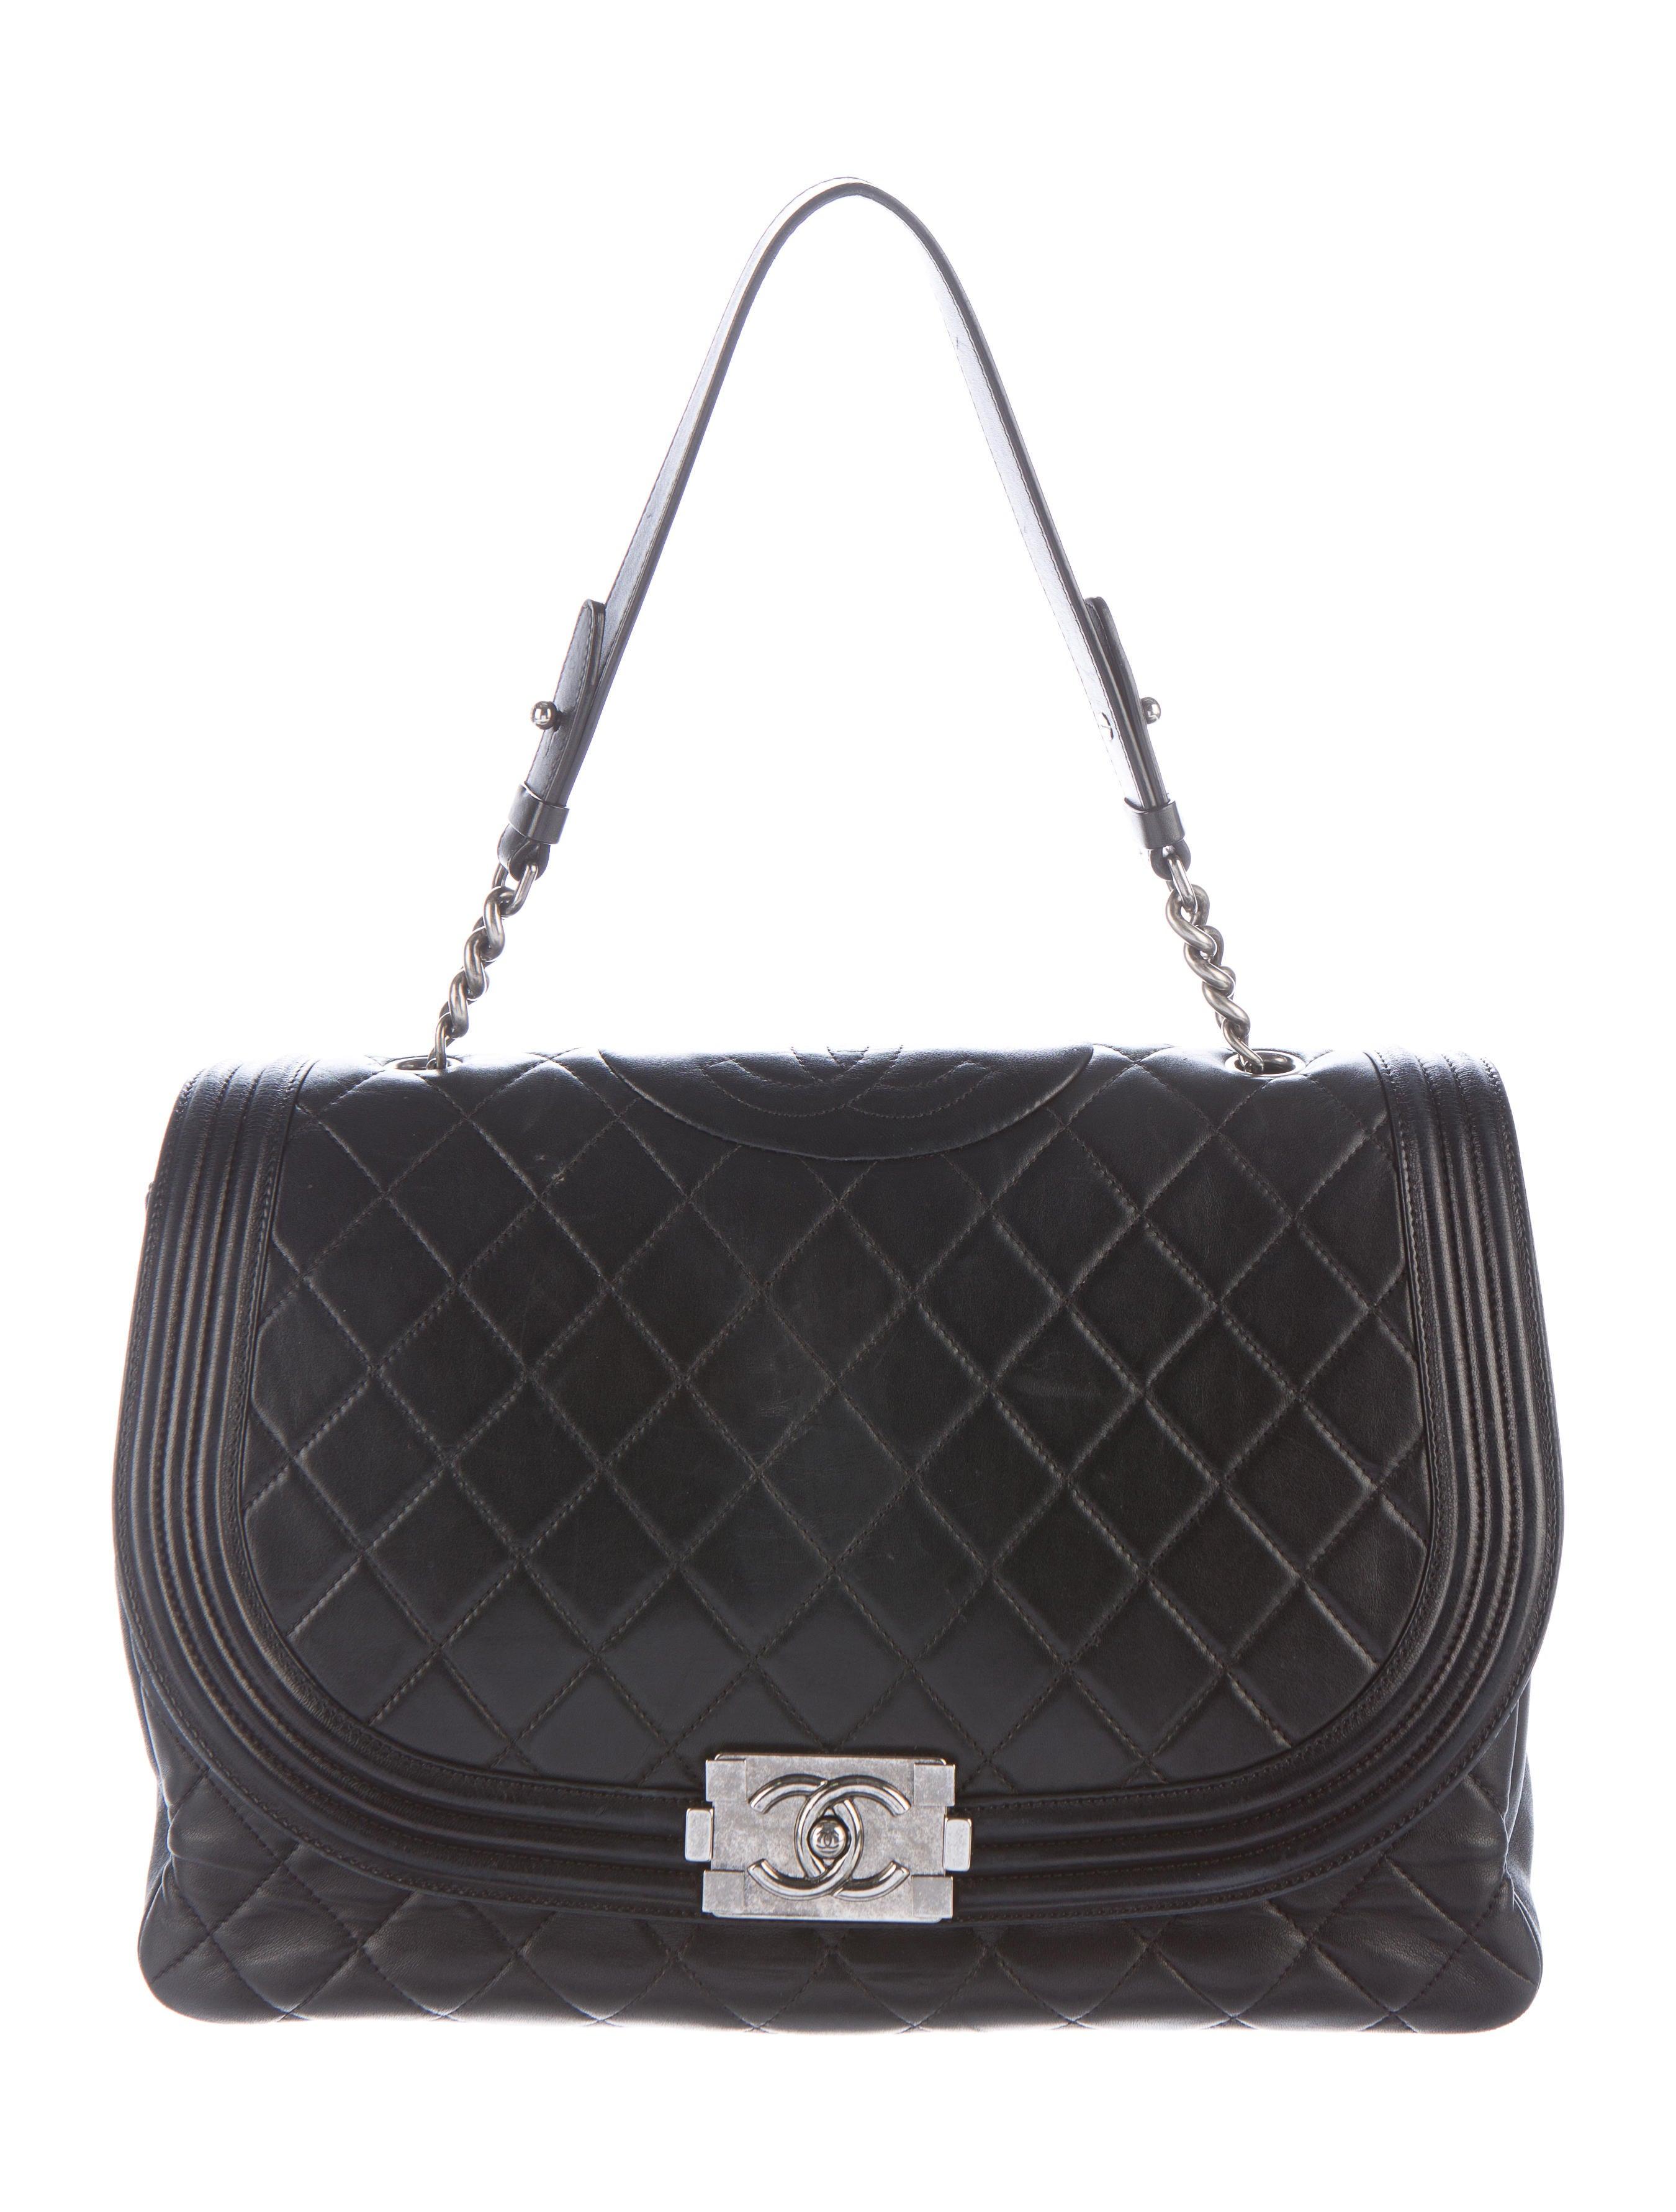 c3e6c56596a1 Chanel Antik Boy Bag - Handbags - CHA162348   The RealReal